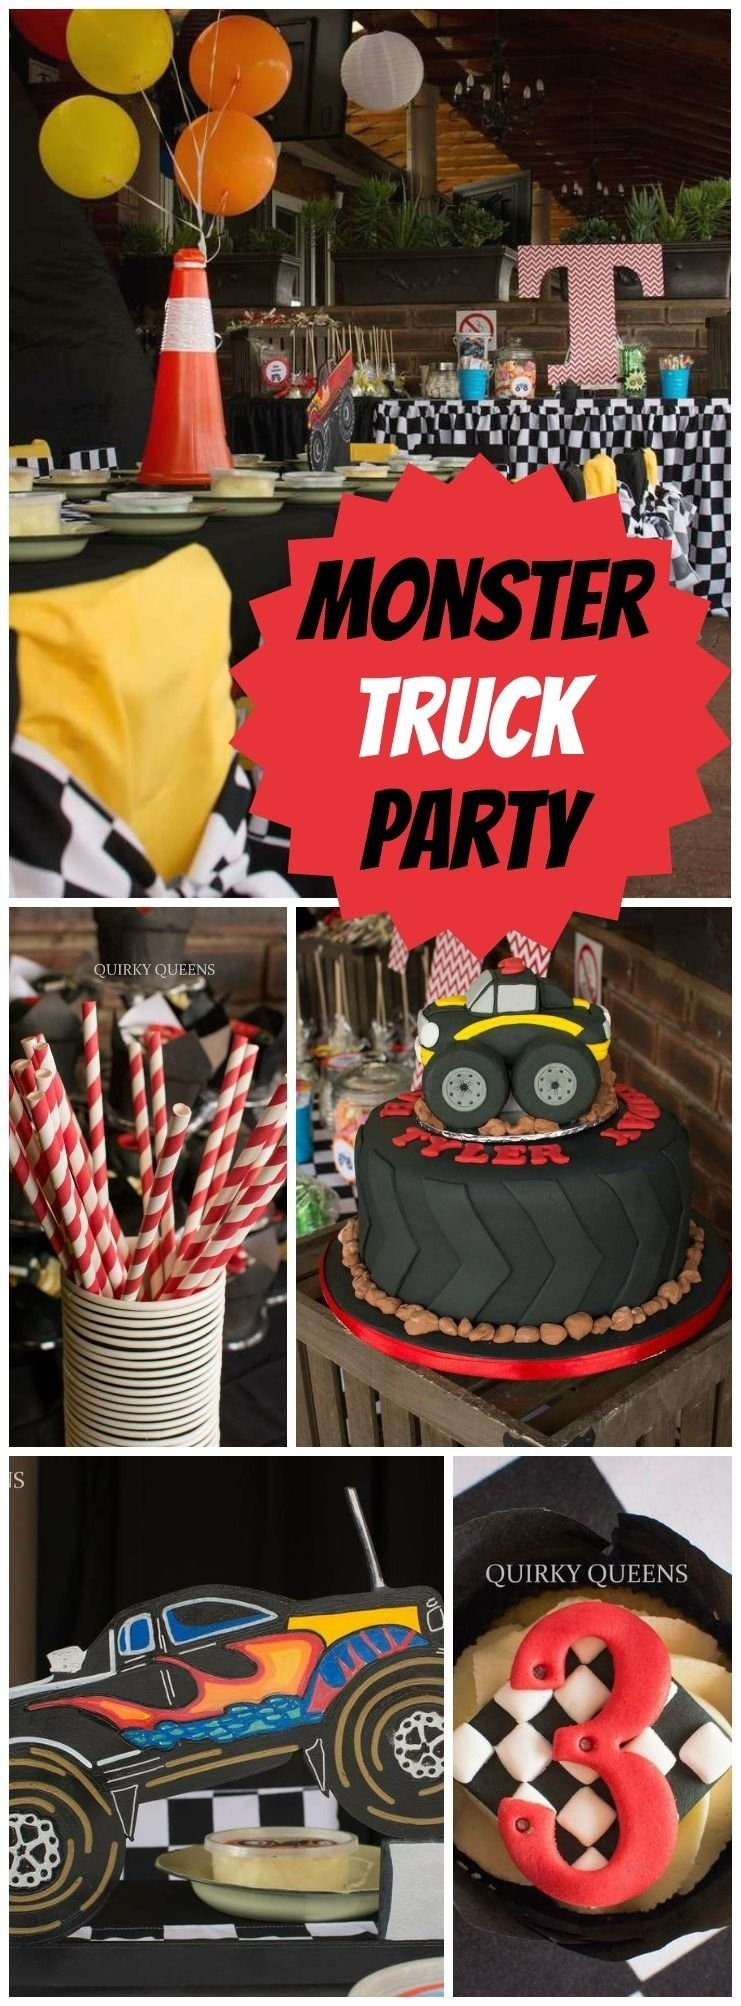 "monster truck party / birthday ""tyler's monster truck party"